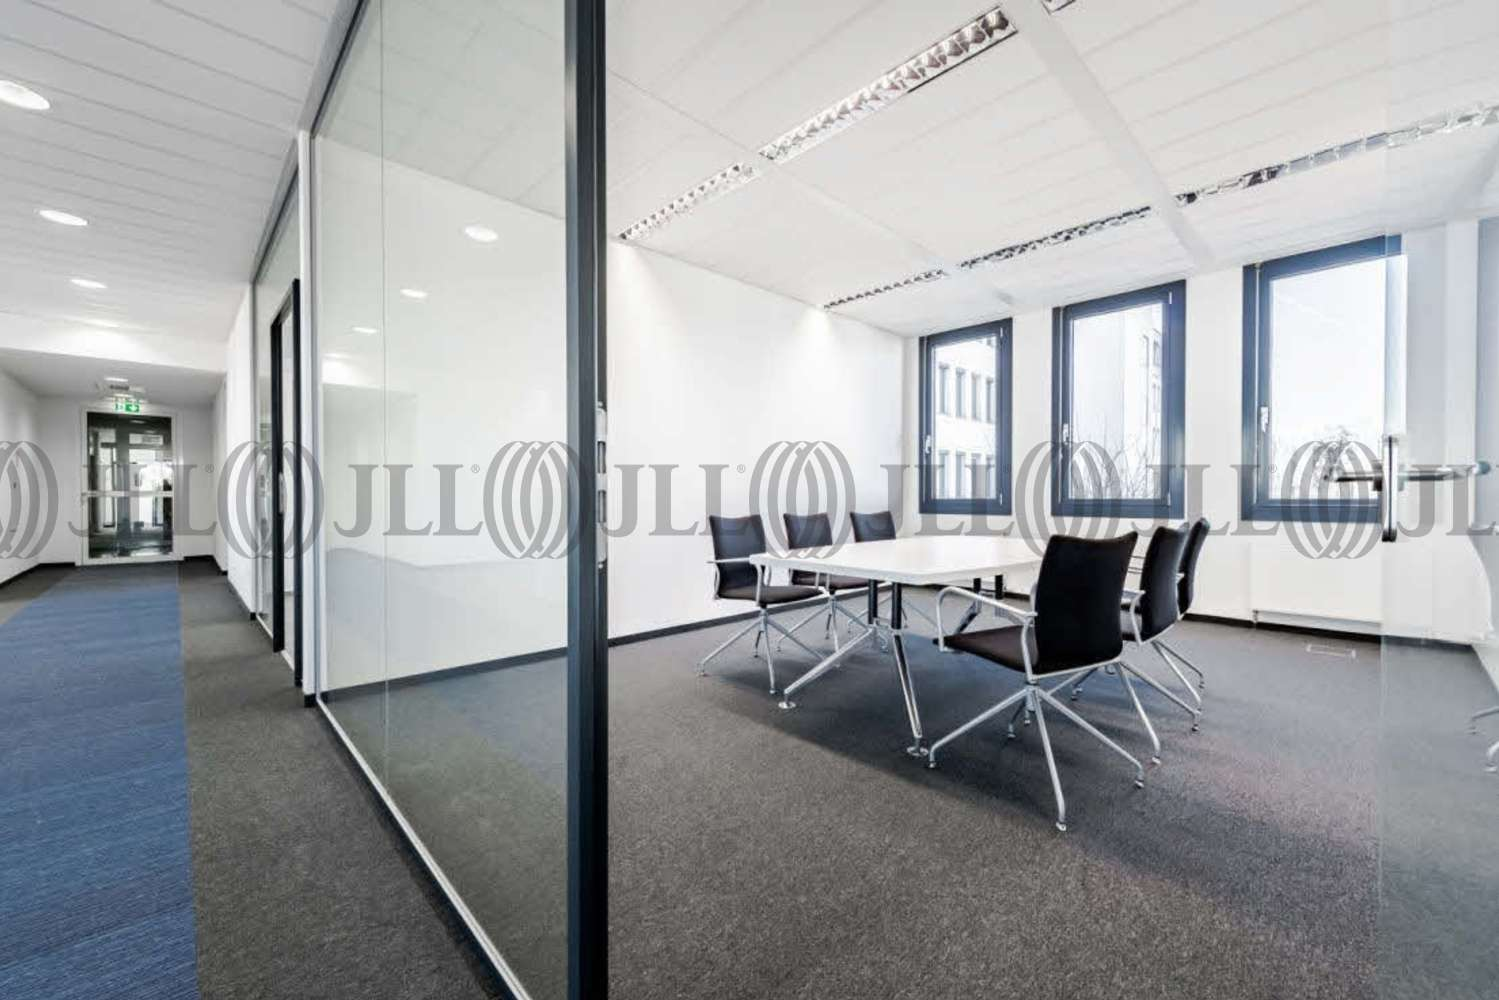 Büros Frankfurt am main, 60489 - Büro - Frankfurt am Main, Rödelheim - F1449 - 10443063